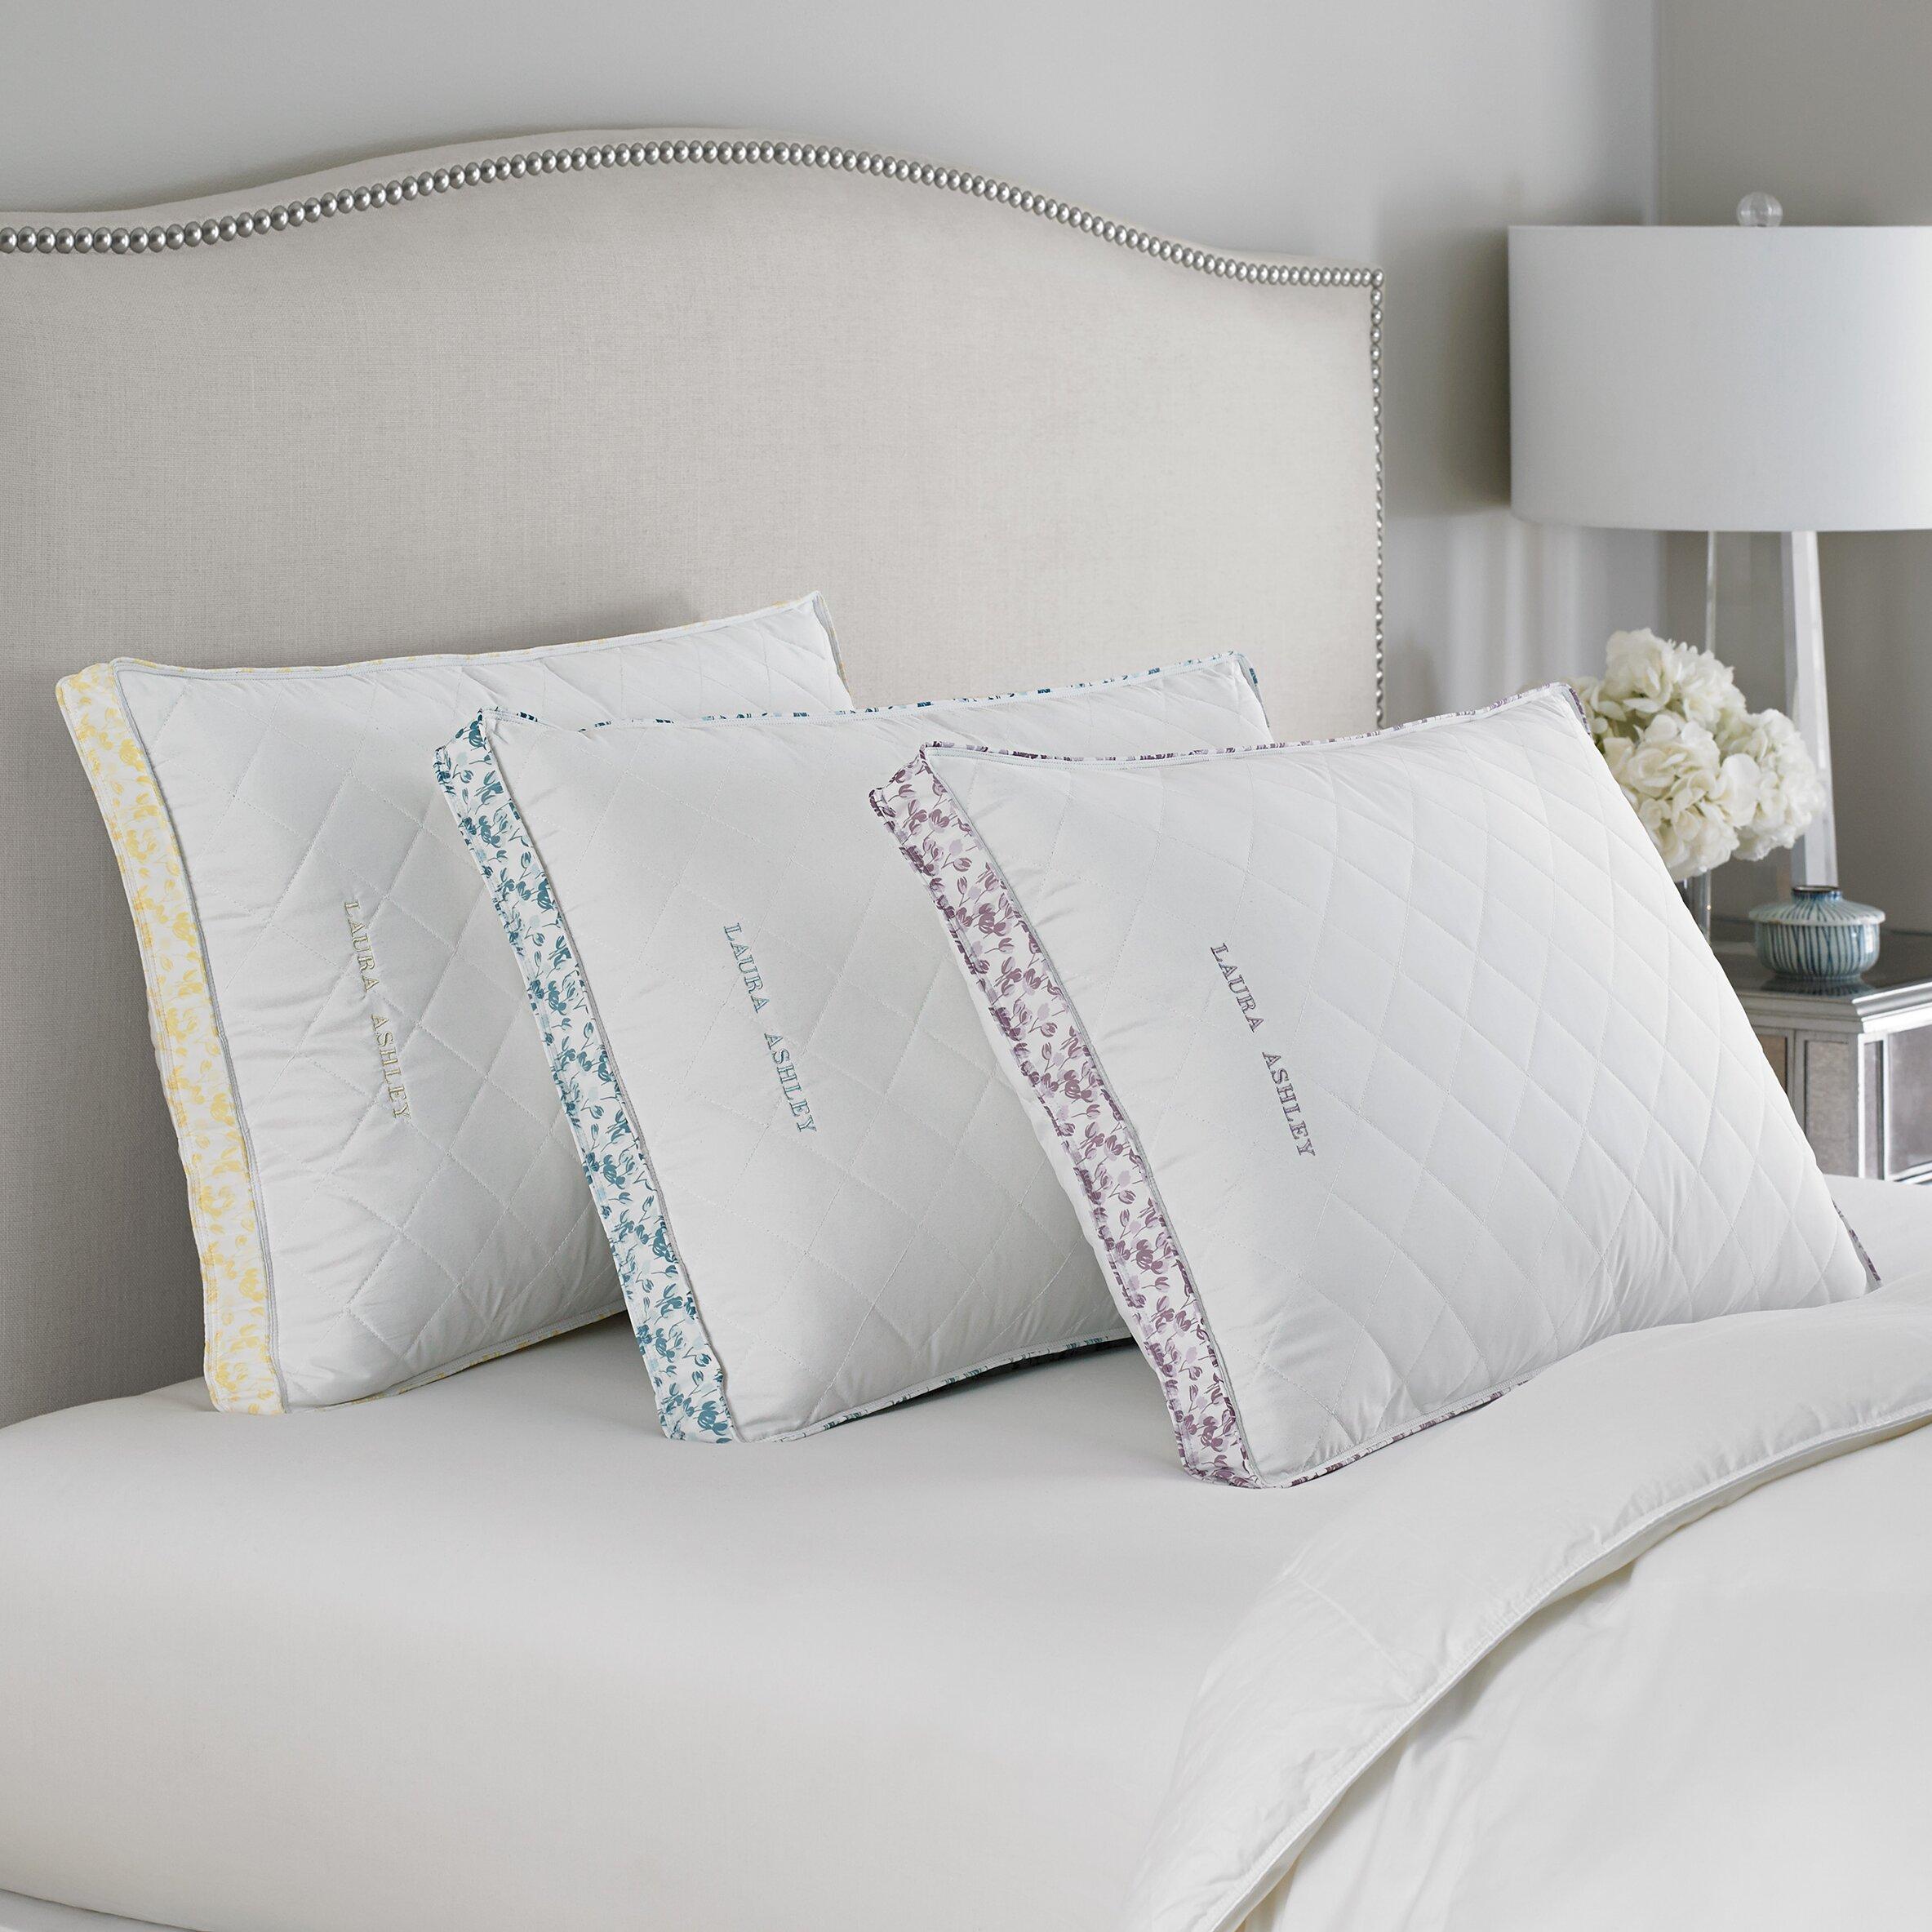 Laura Ashley Bedroom Laura Ashley Home Ava Polyfill Pillow Reviews Wayfair